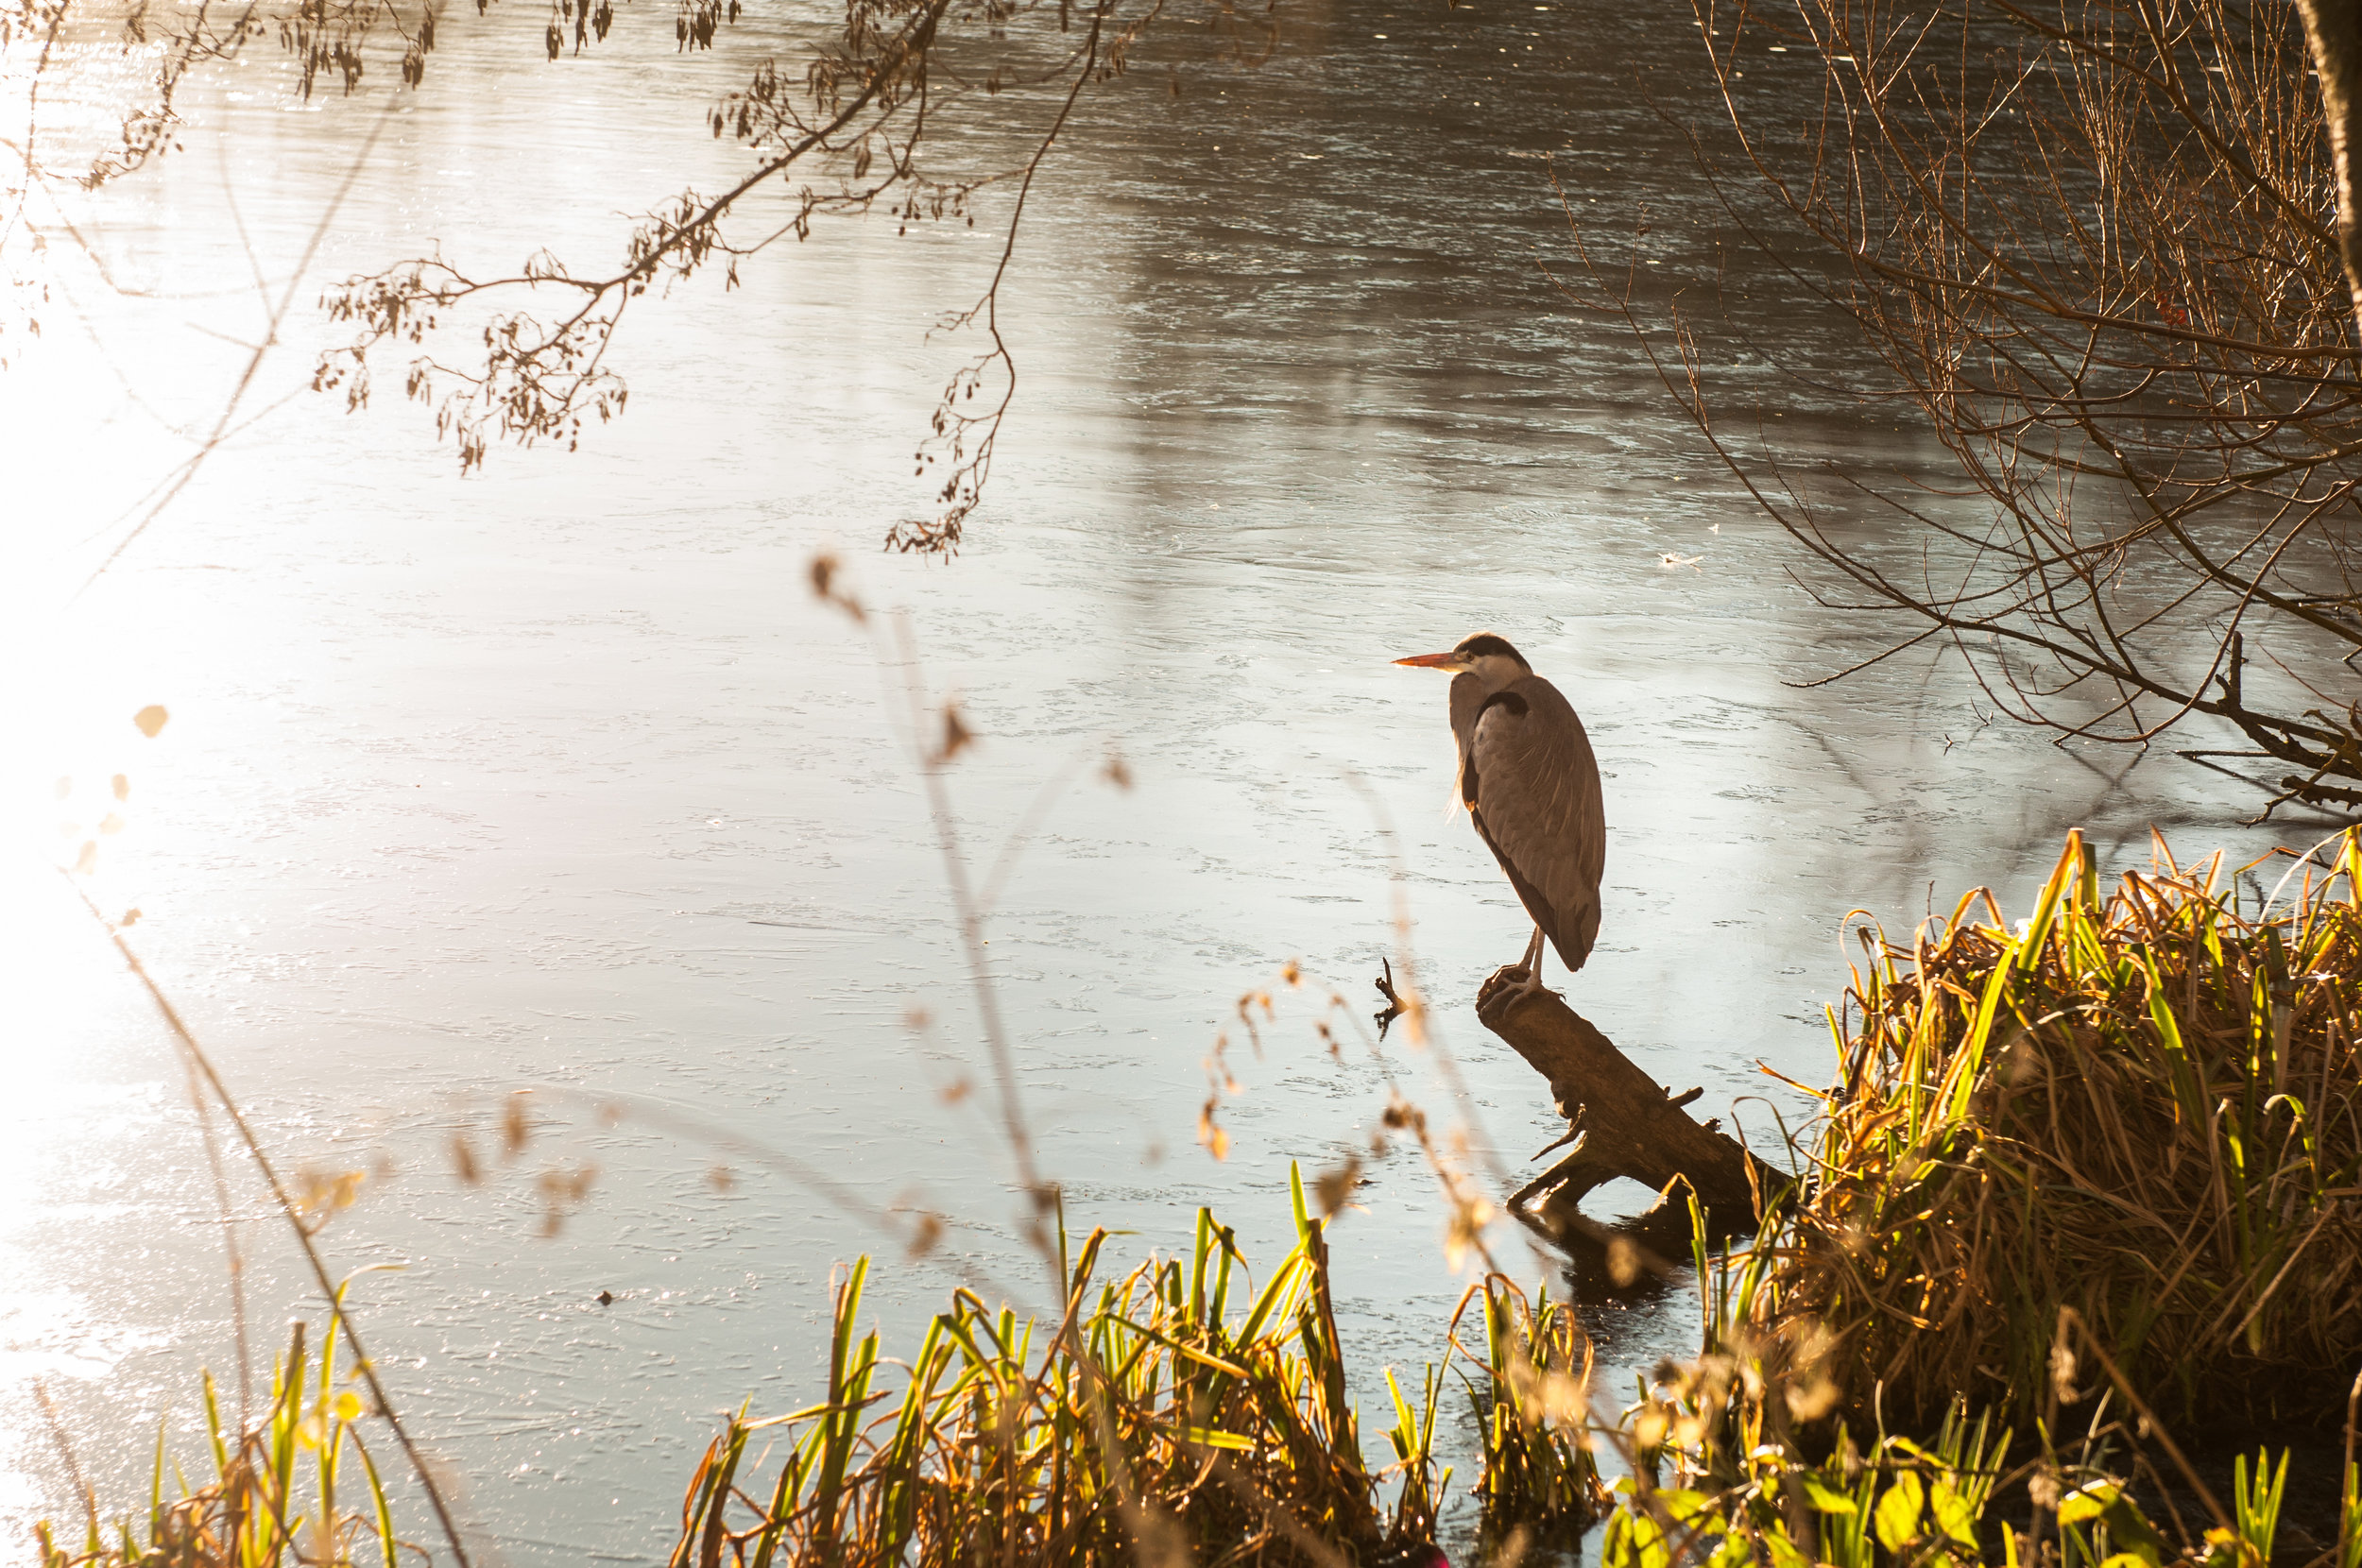 Ptaki lochend park - 2019 - MAR_2573.jpg